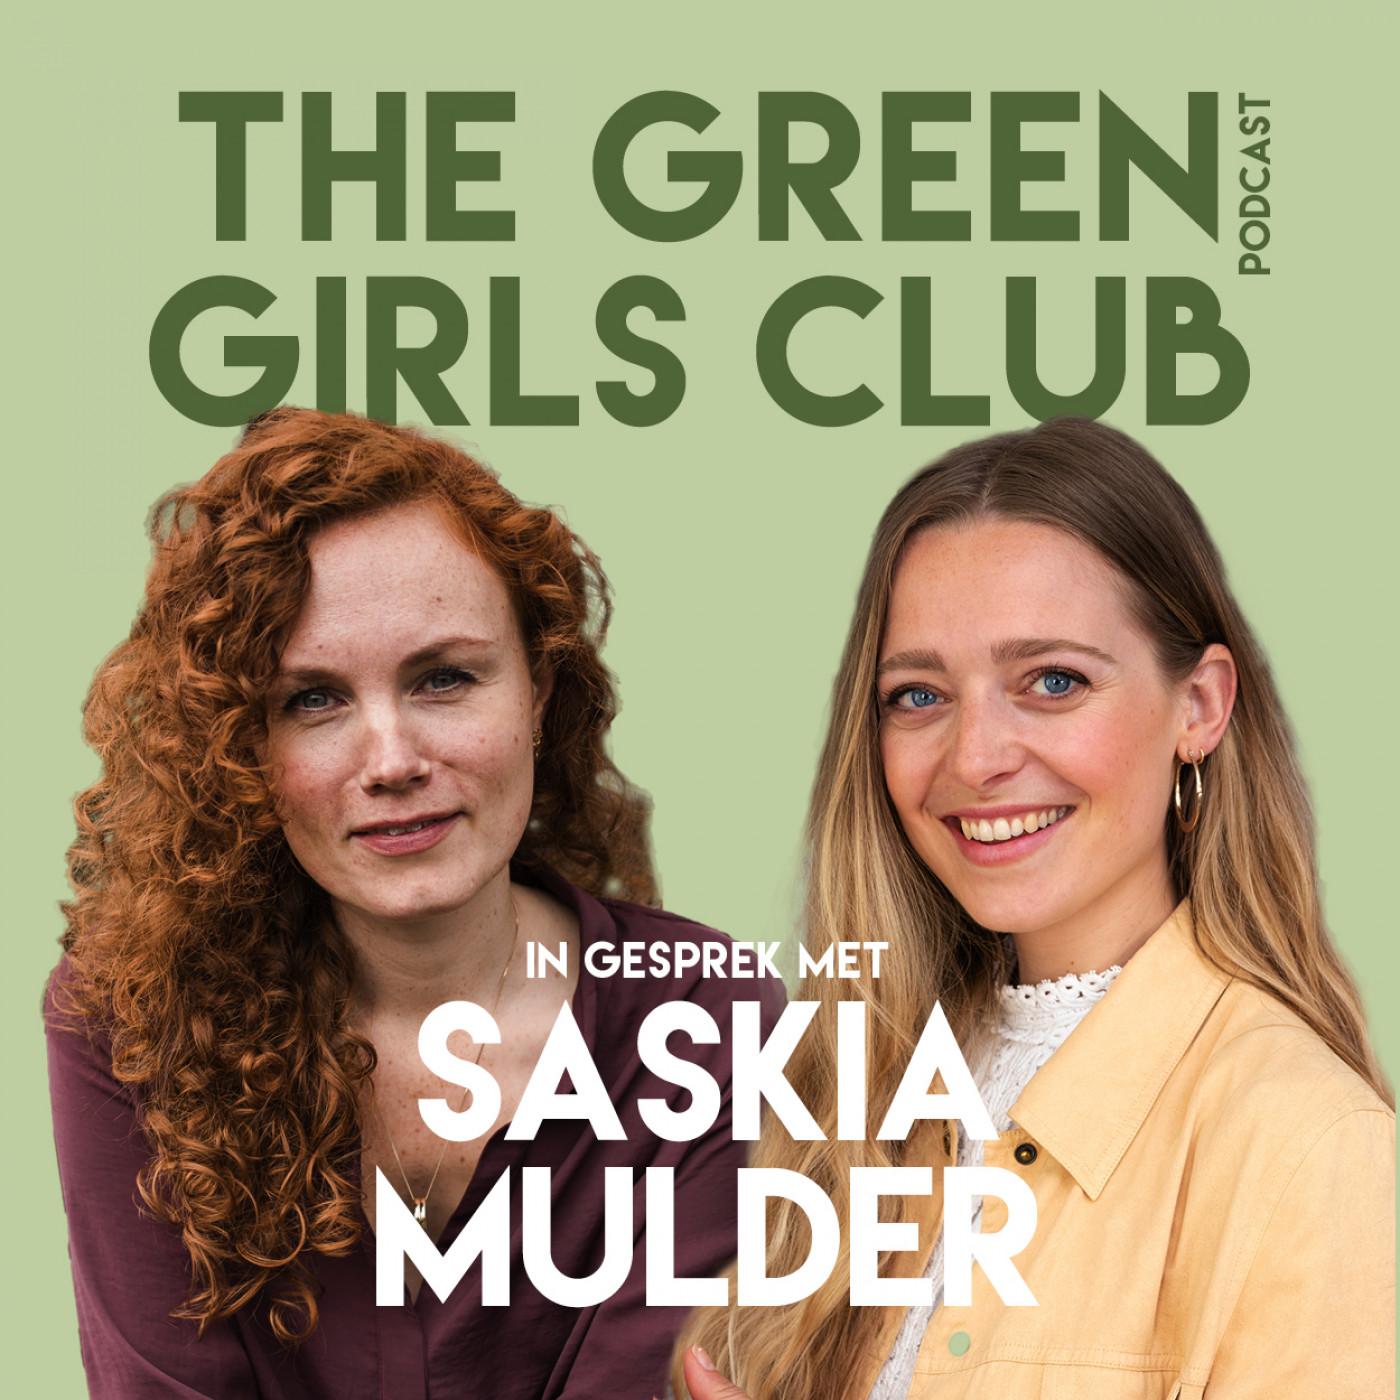 #04 - Saskia Mulder over een duurzame kinderwens